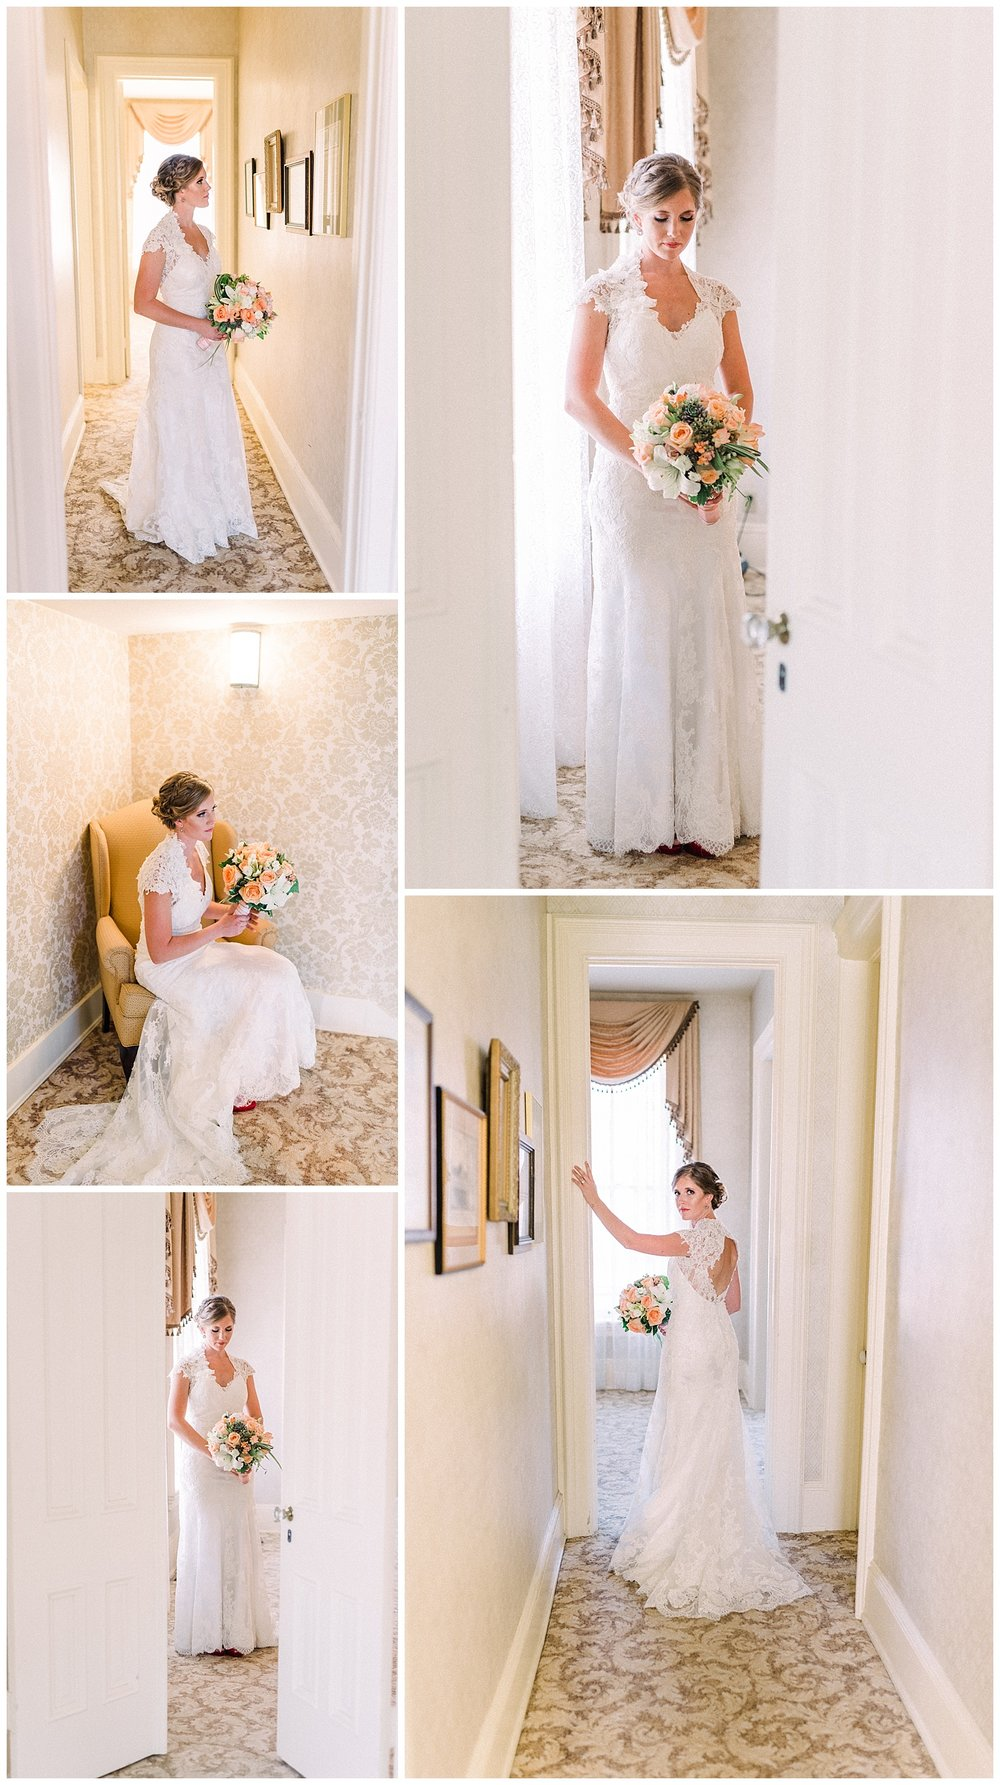 Nicole Corrine Iowa Wedding Photographer Snowden House Wedding Waterloo Iowa 9.jpg